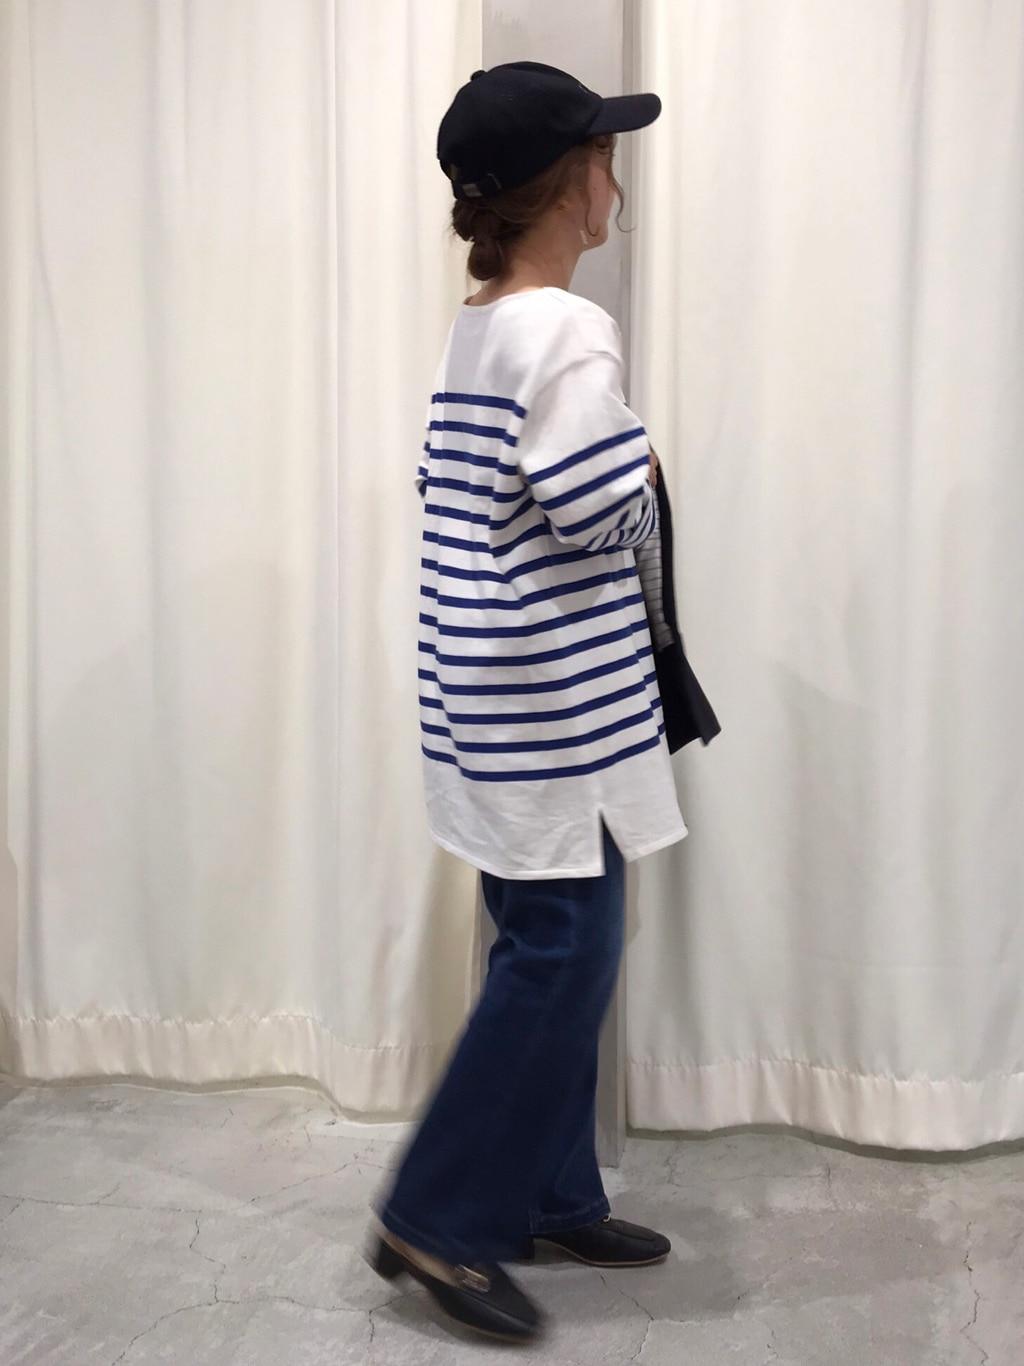 Dot and Stripes CHILD WOMAN ルミネ池袋 身長:143cm 2021.02.19